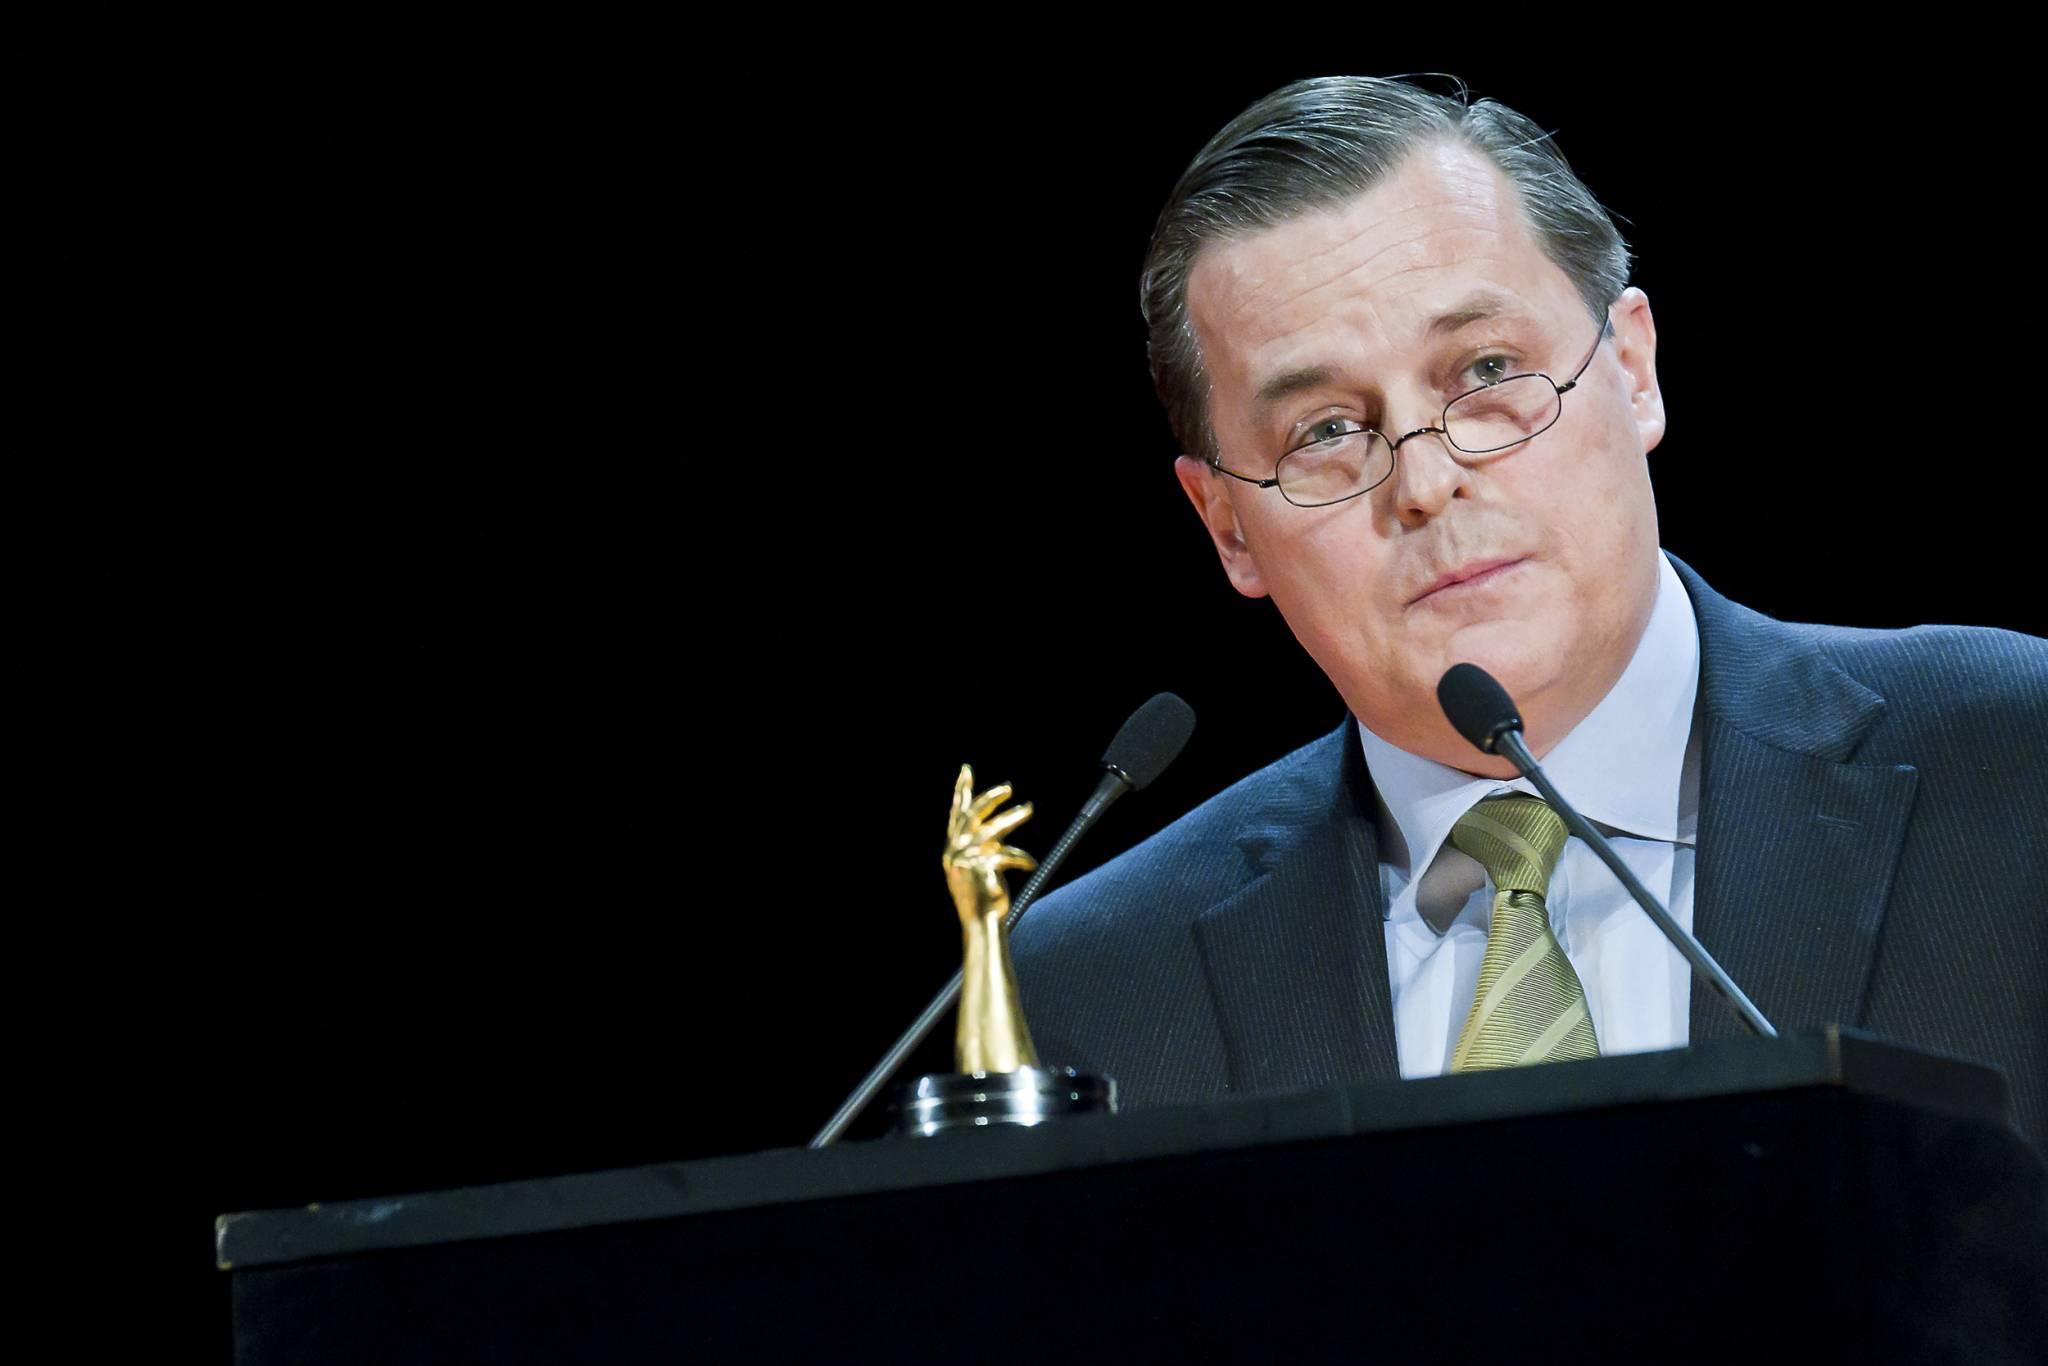 Pillippe Merk, CEO of Audemars Piguet, the winner brand of the 2011 Public Prize